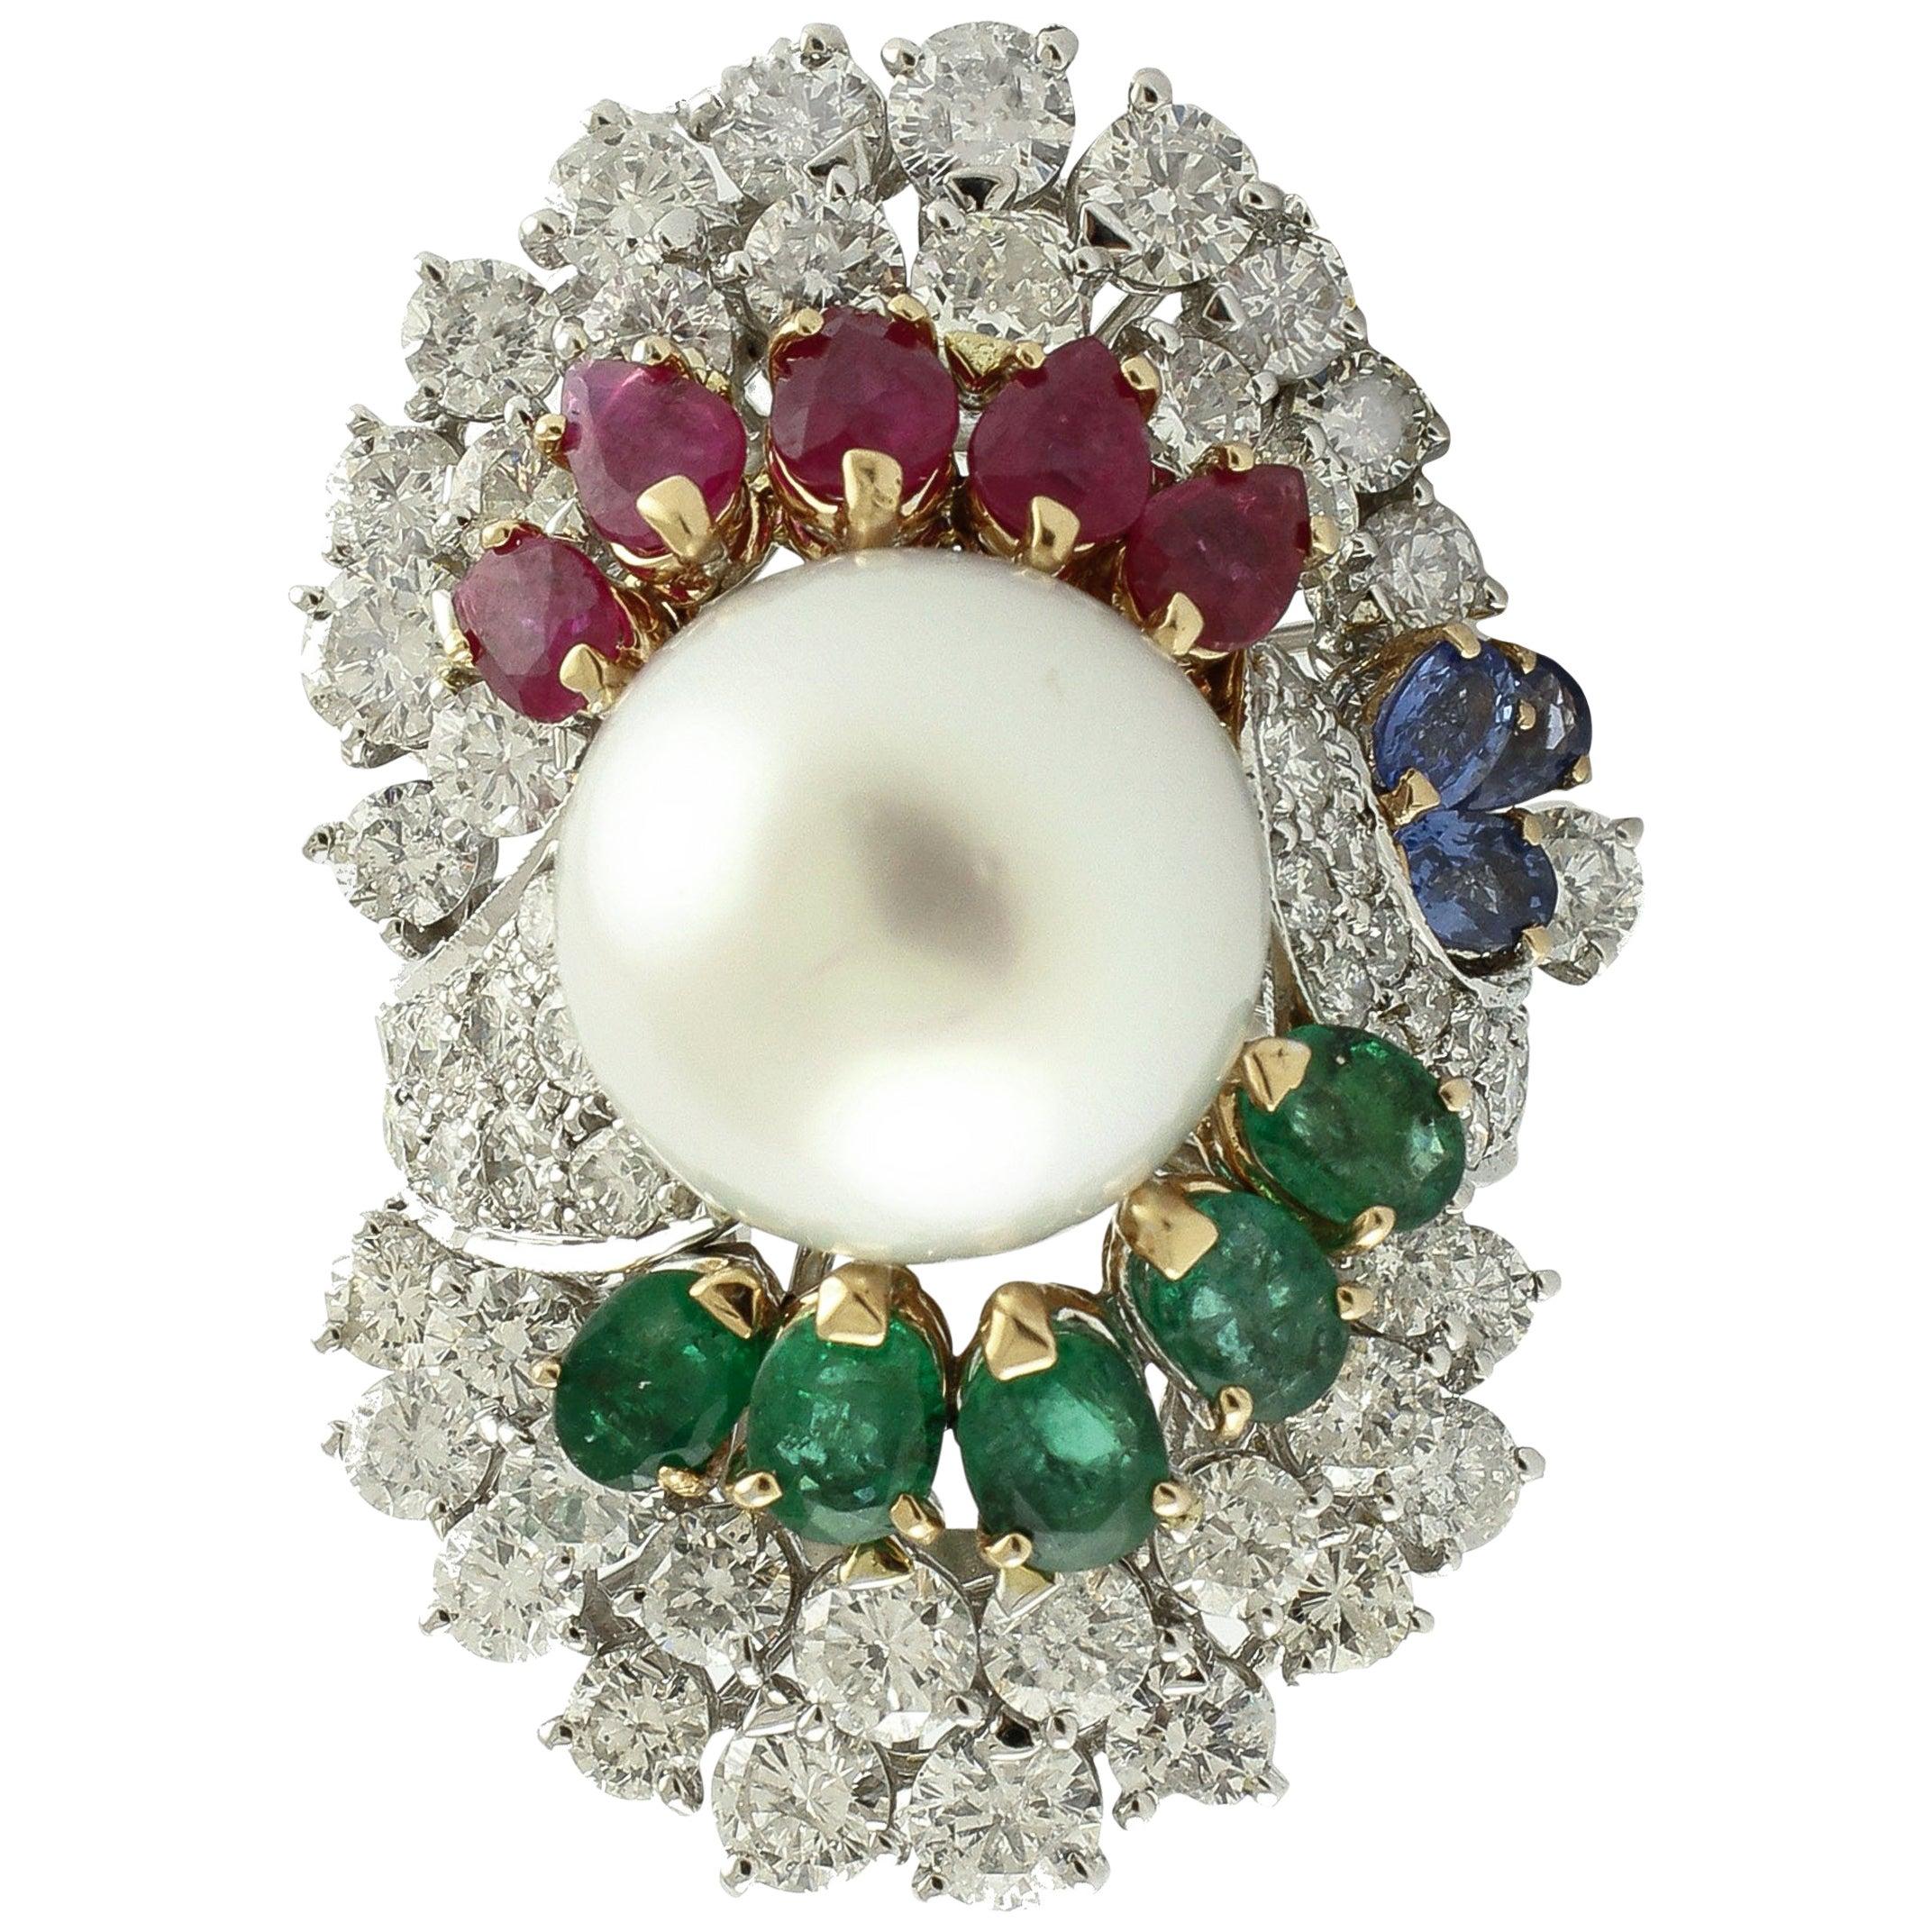 Diamonds Sapphires Rubies Emeralds Pearl White Gold Ring